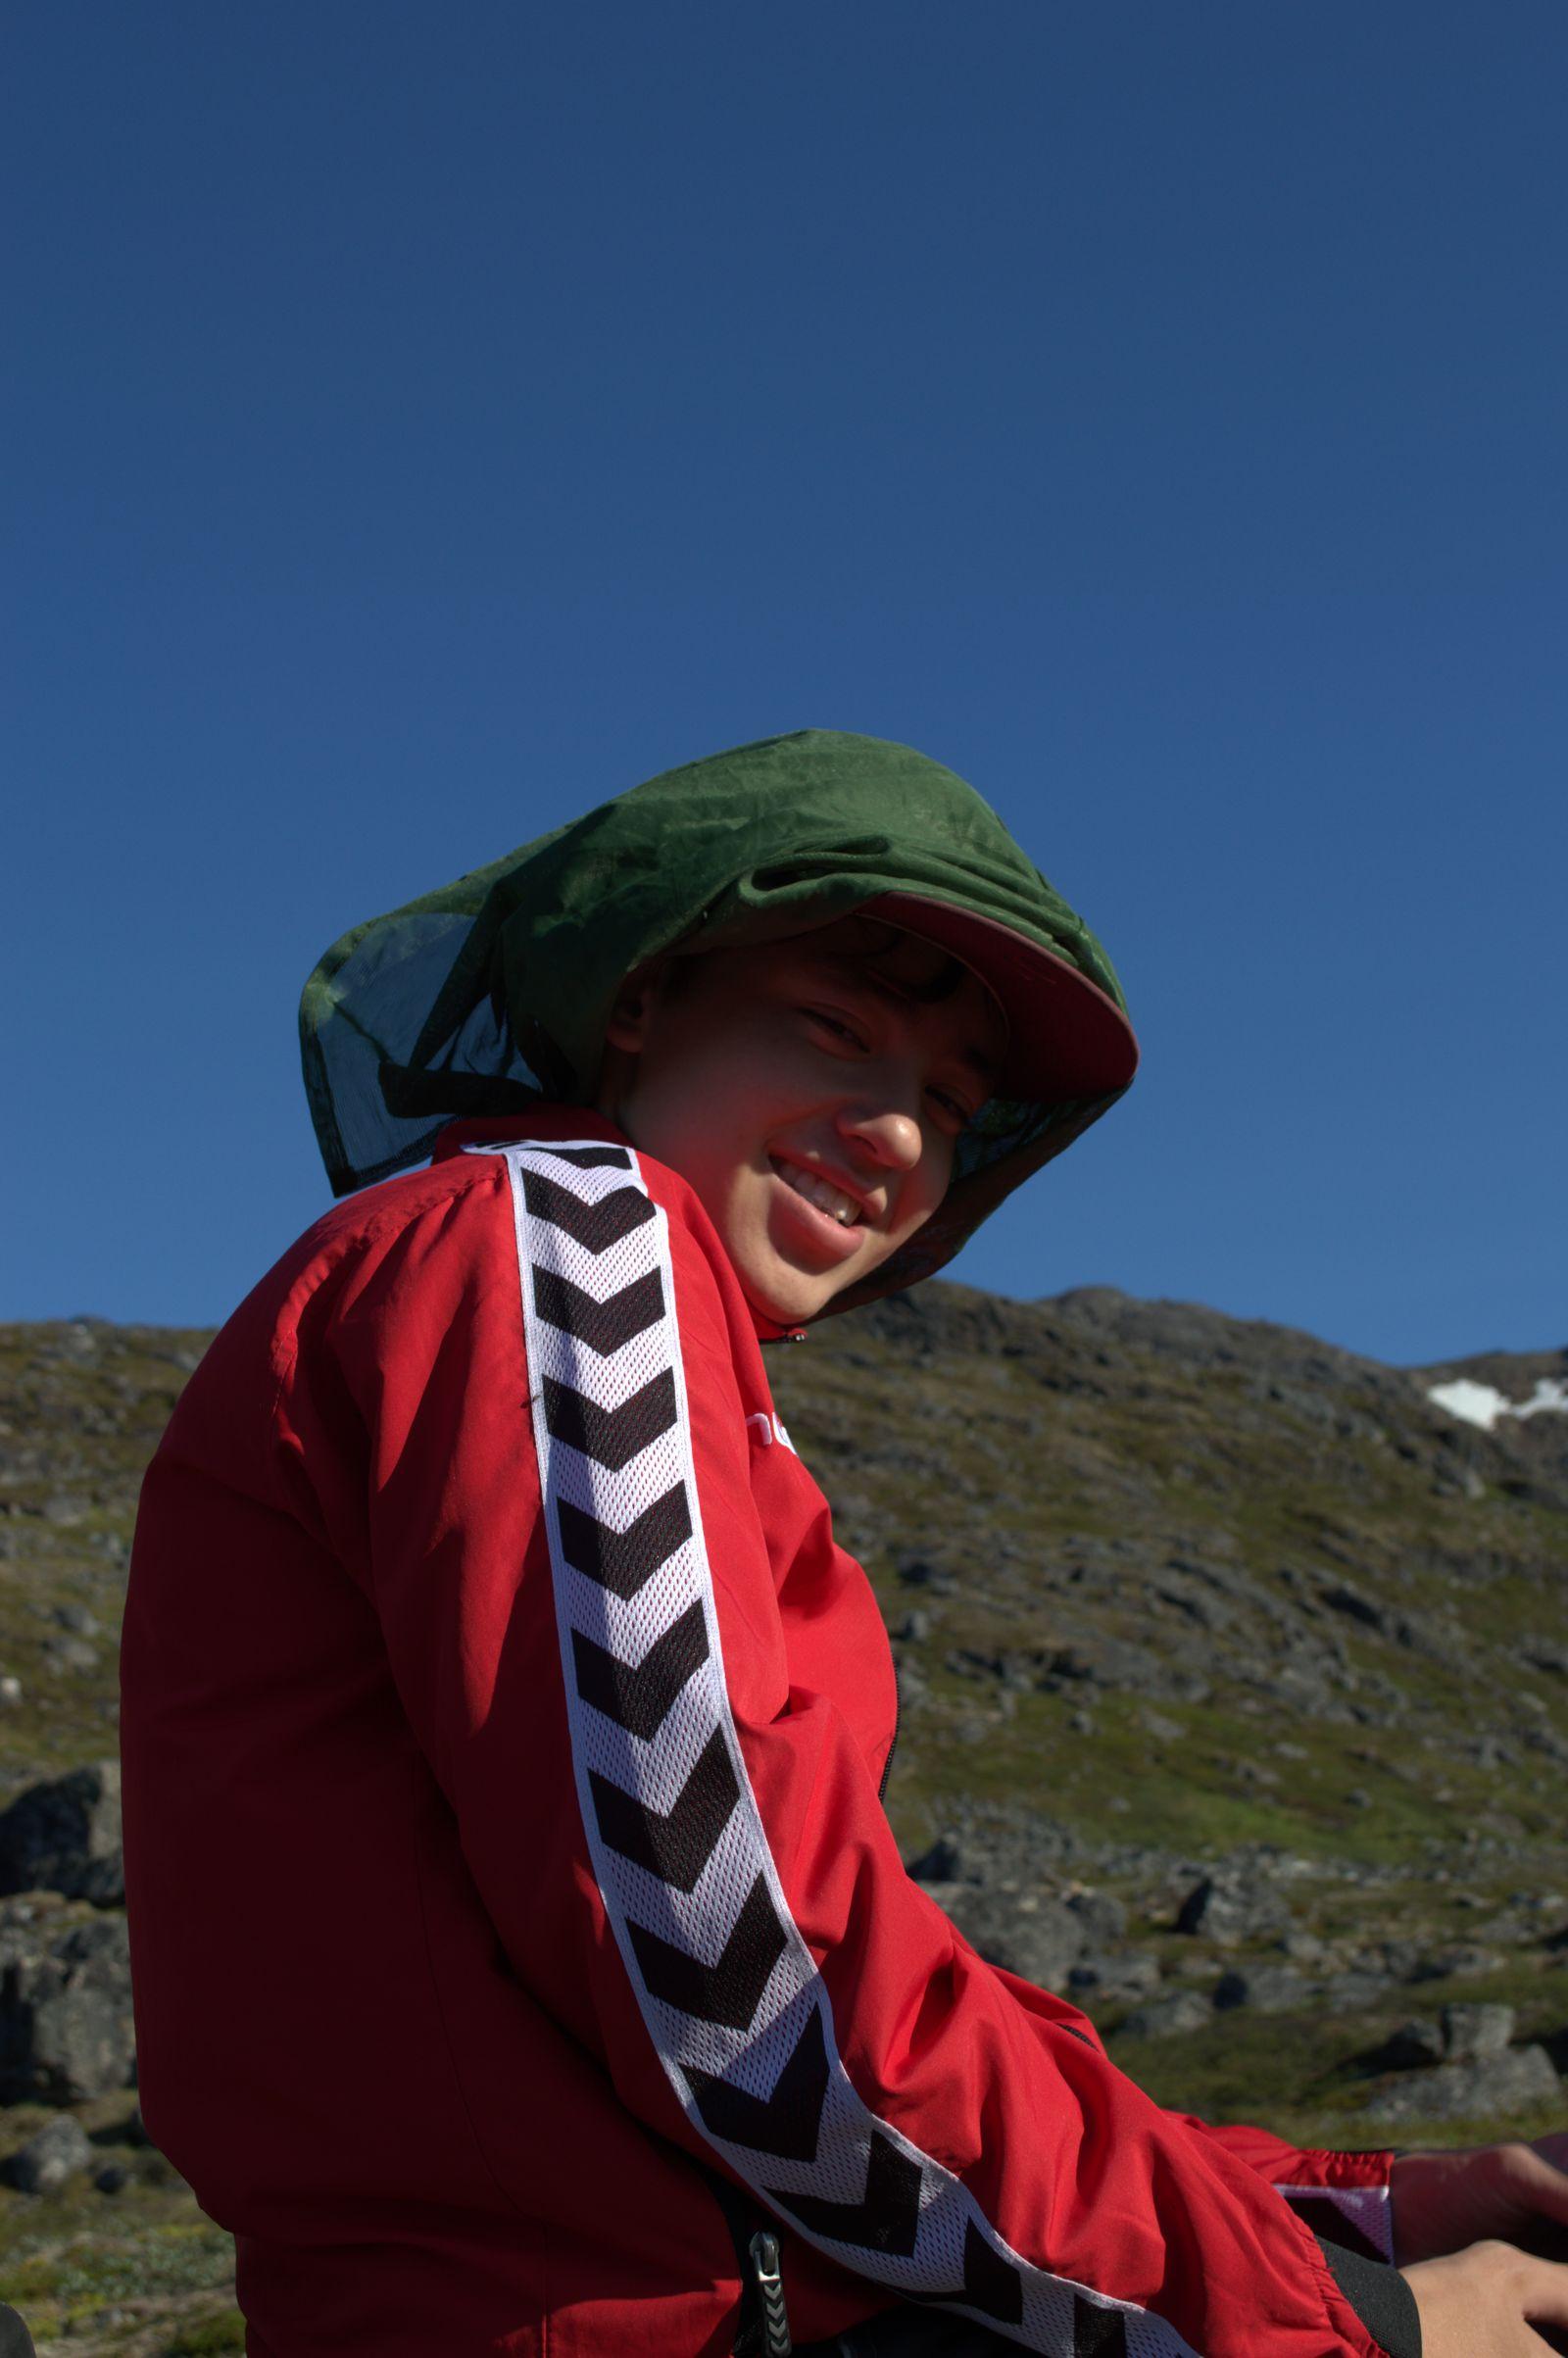 2014-07-24-1906_-_Anders-Martinsen_3